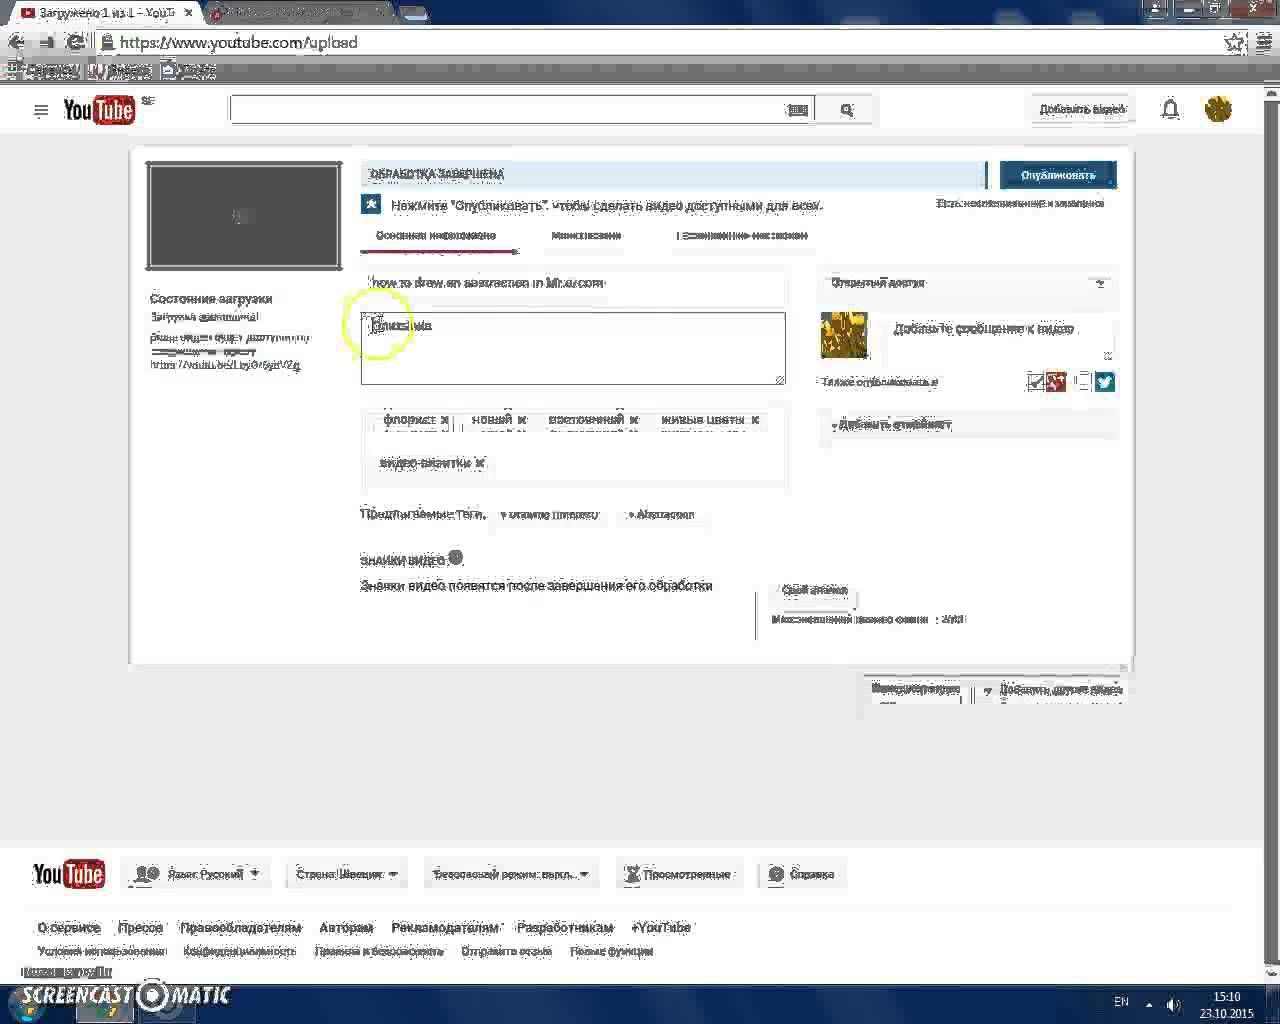 Perevodchik Onlajn Yandeks Ili Gugl Yandeks